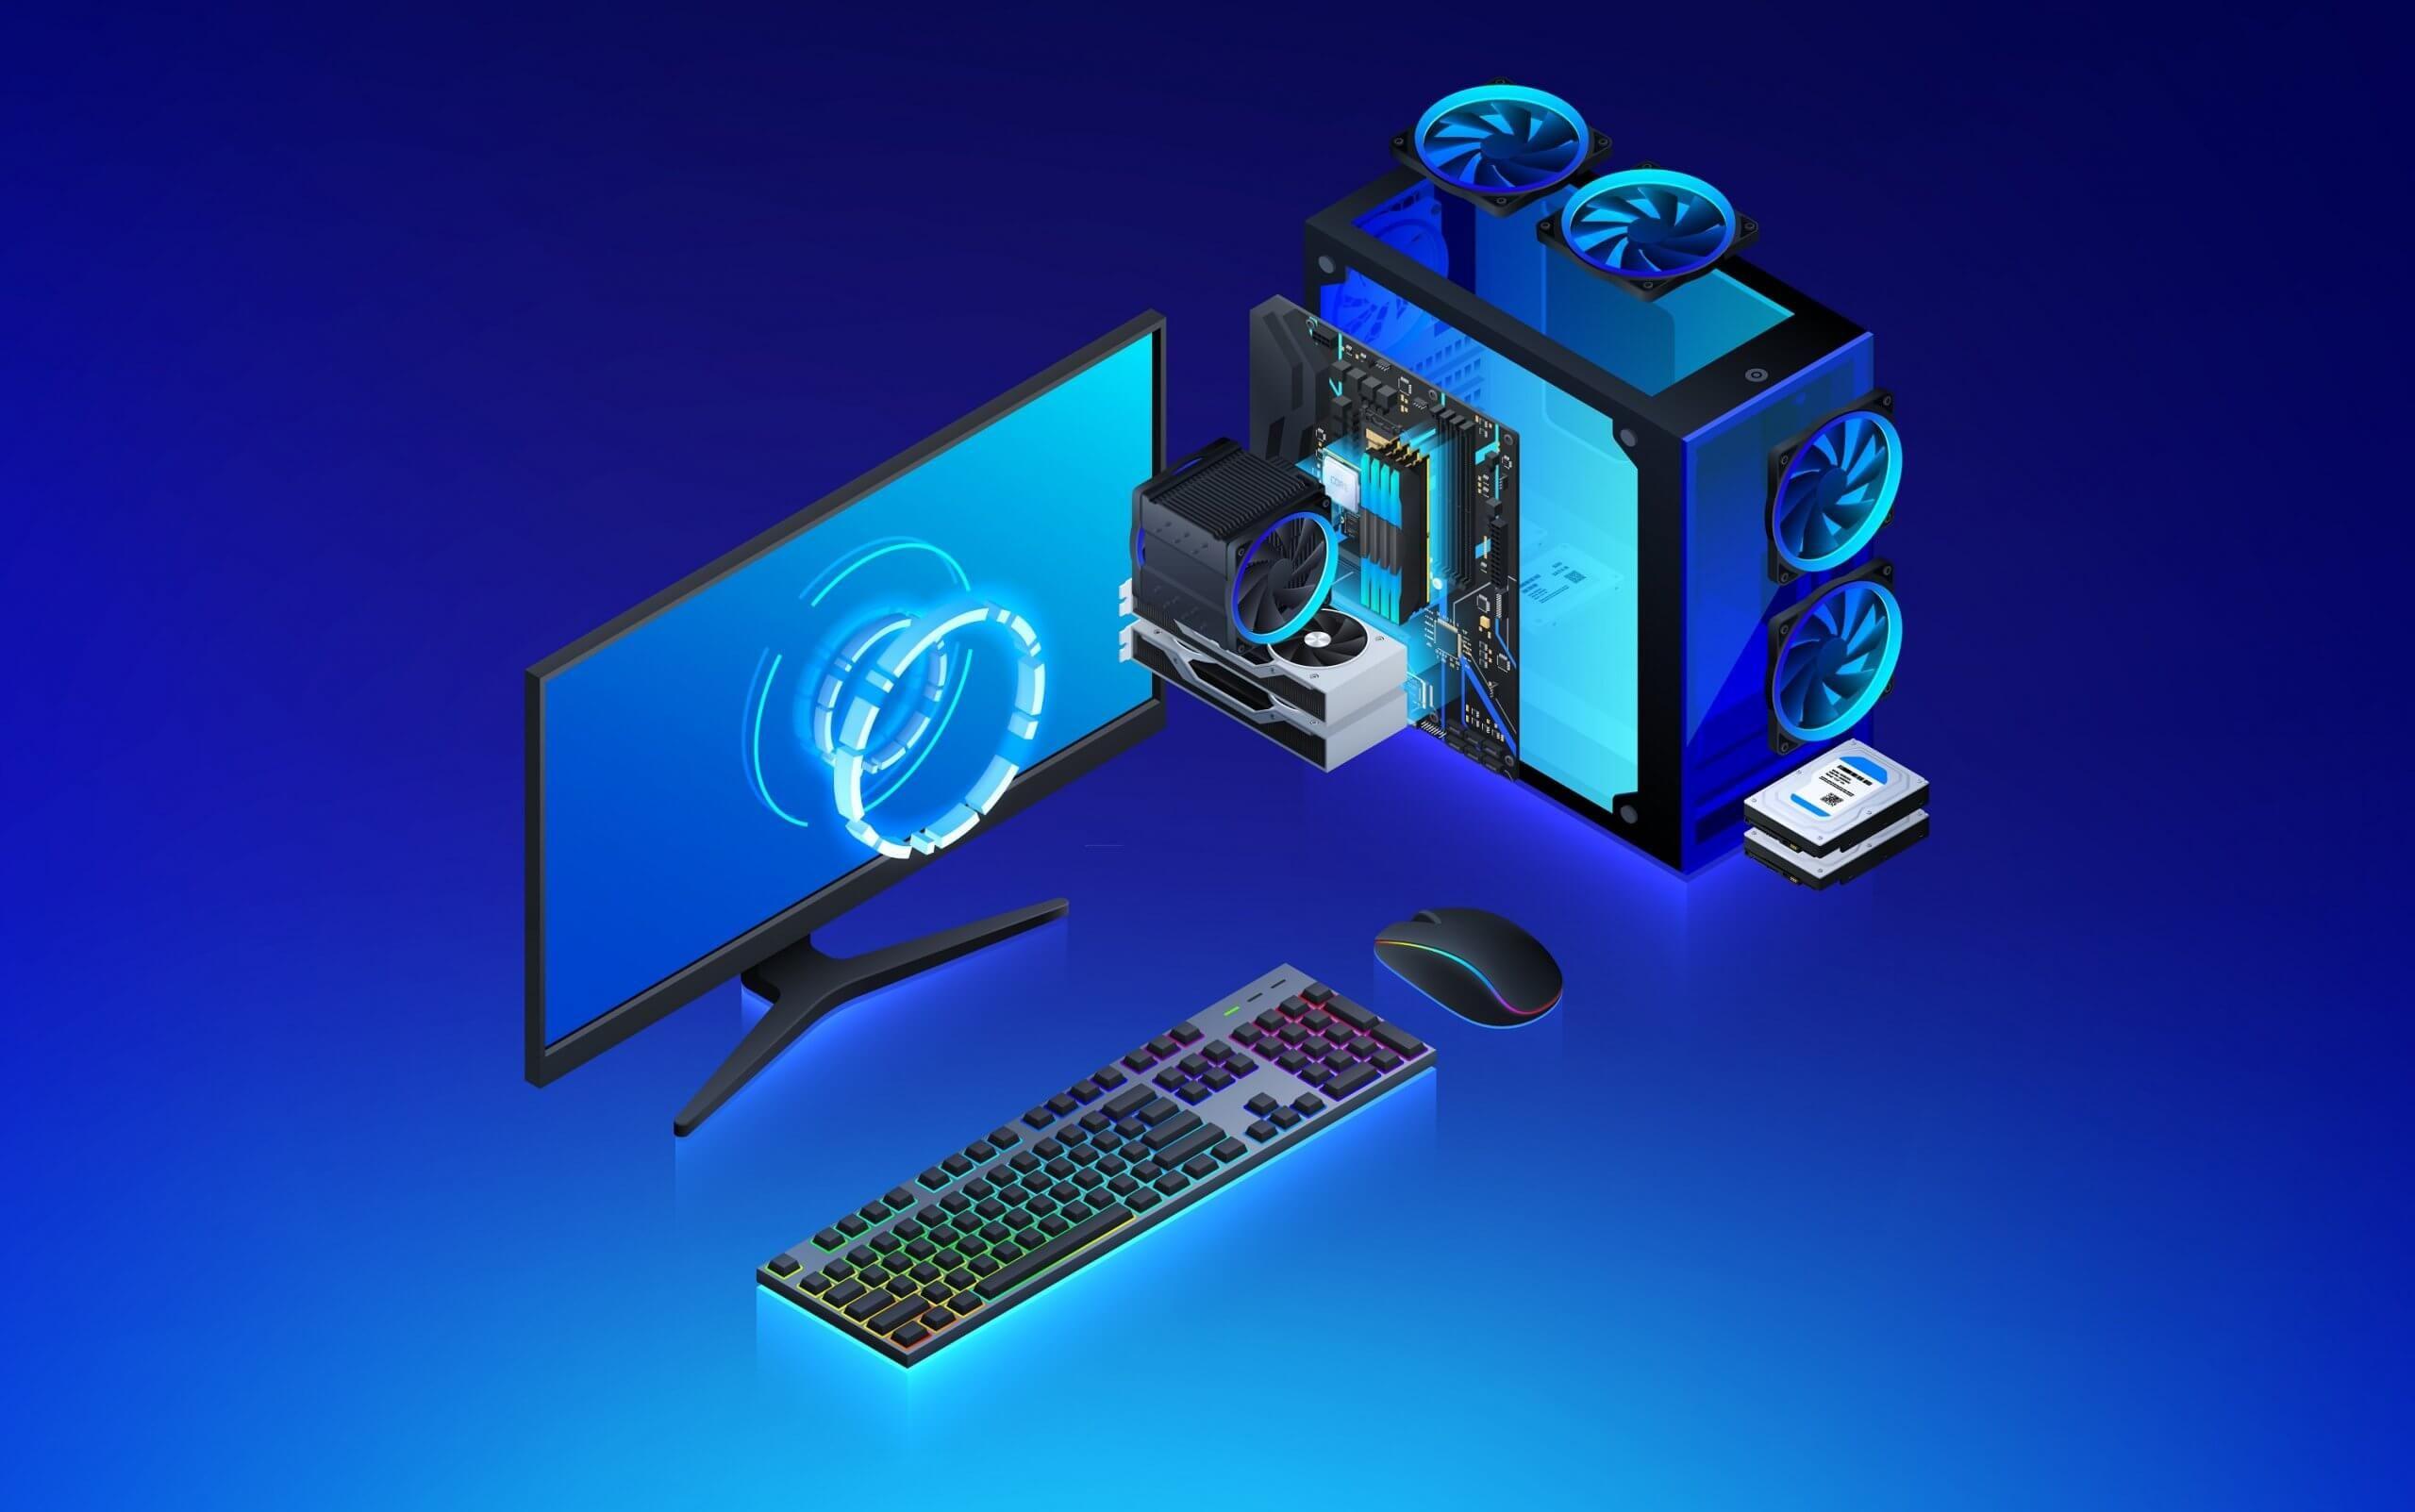 Best Pc Component Deals For Cyber Monday Pc Components Best Pc Pc Store